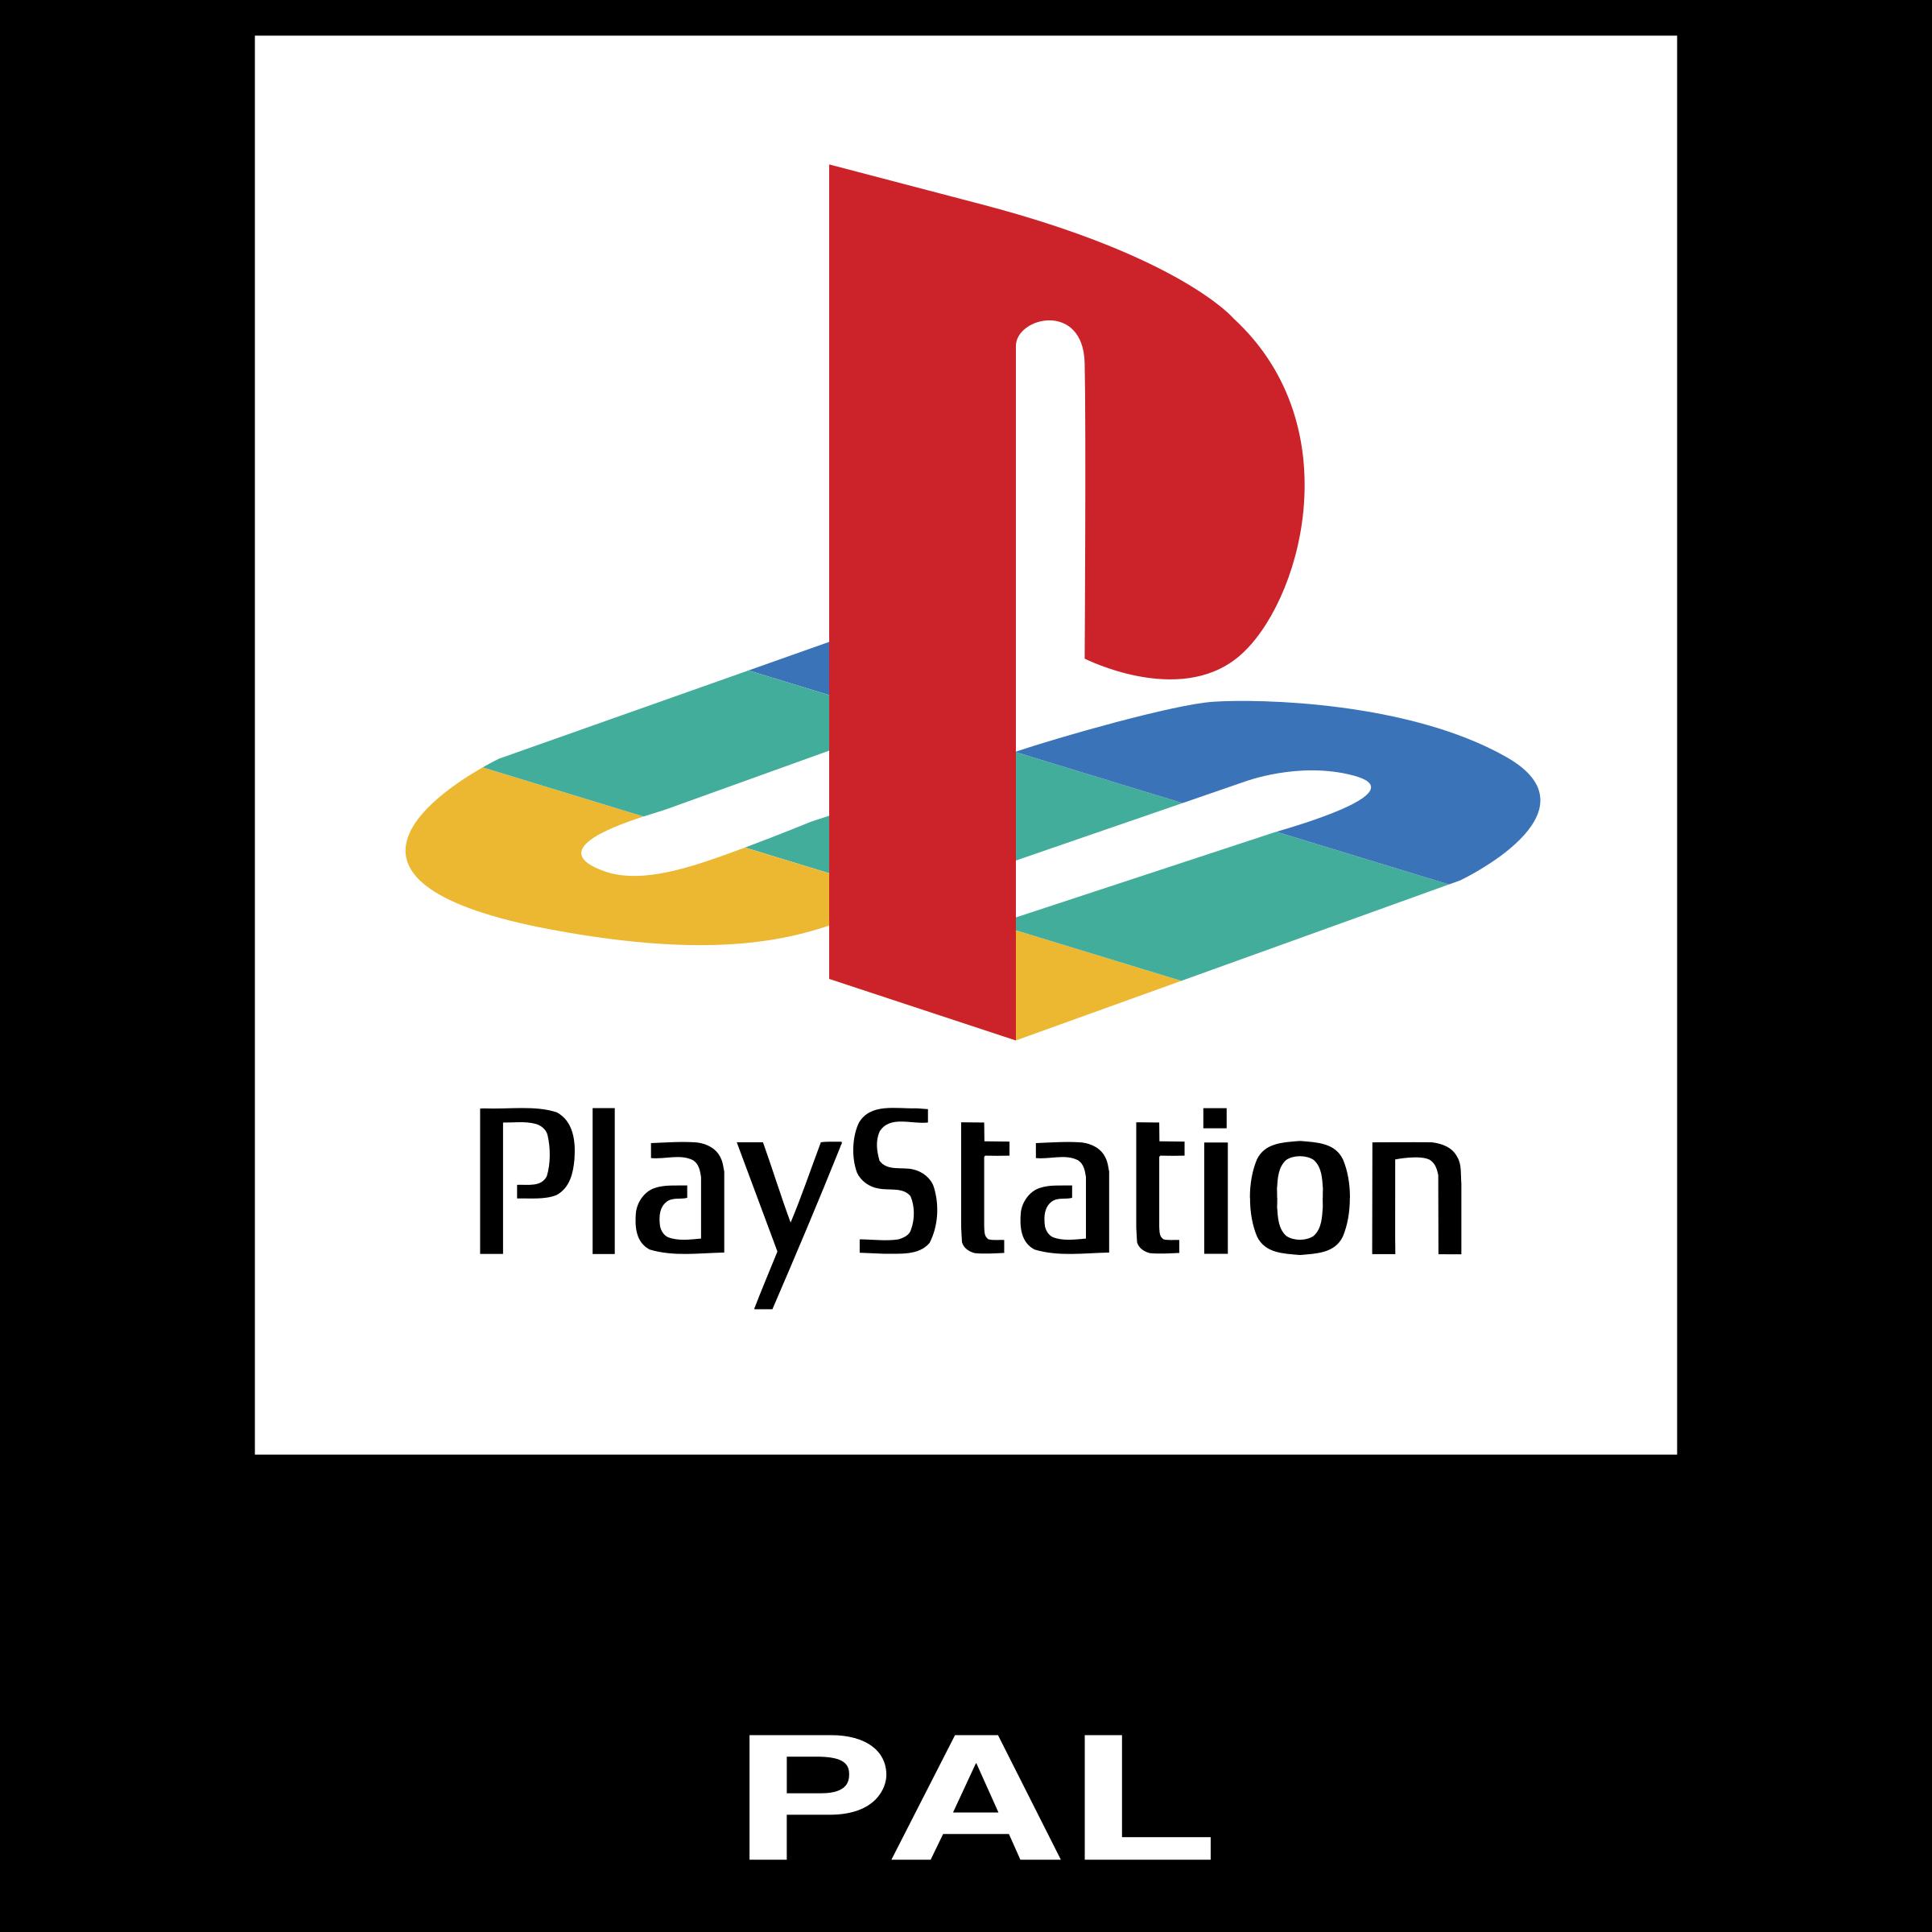 playstation pal logo png transparent svg vector freebie supply rh freebiesupply com playstation 1 logo youtube playstation 1 logo sticker